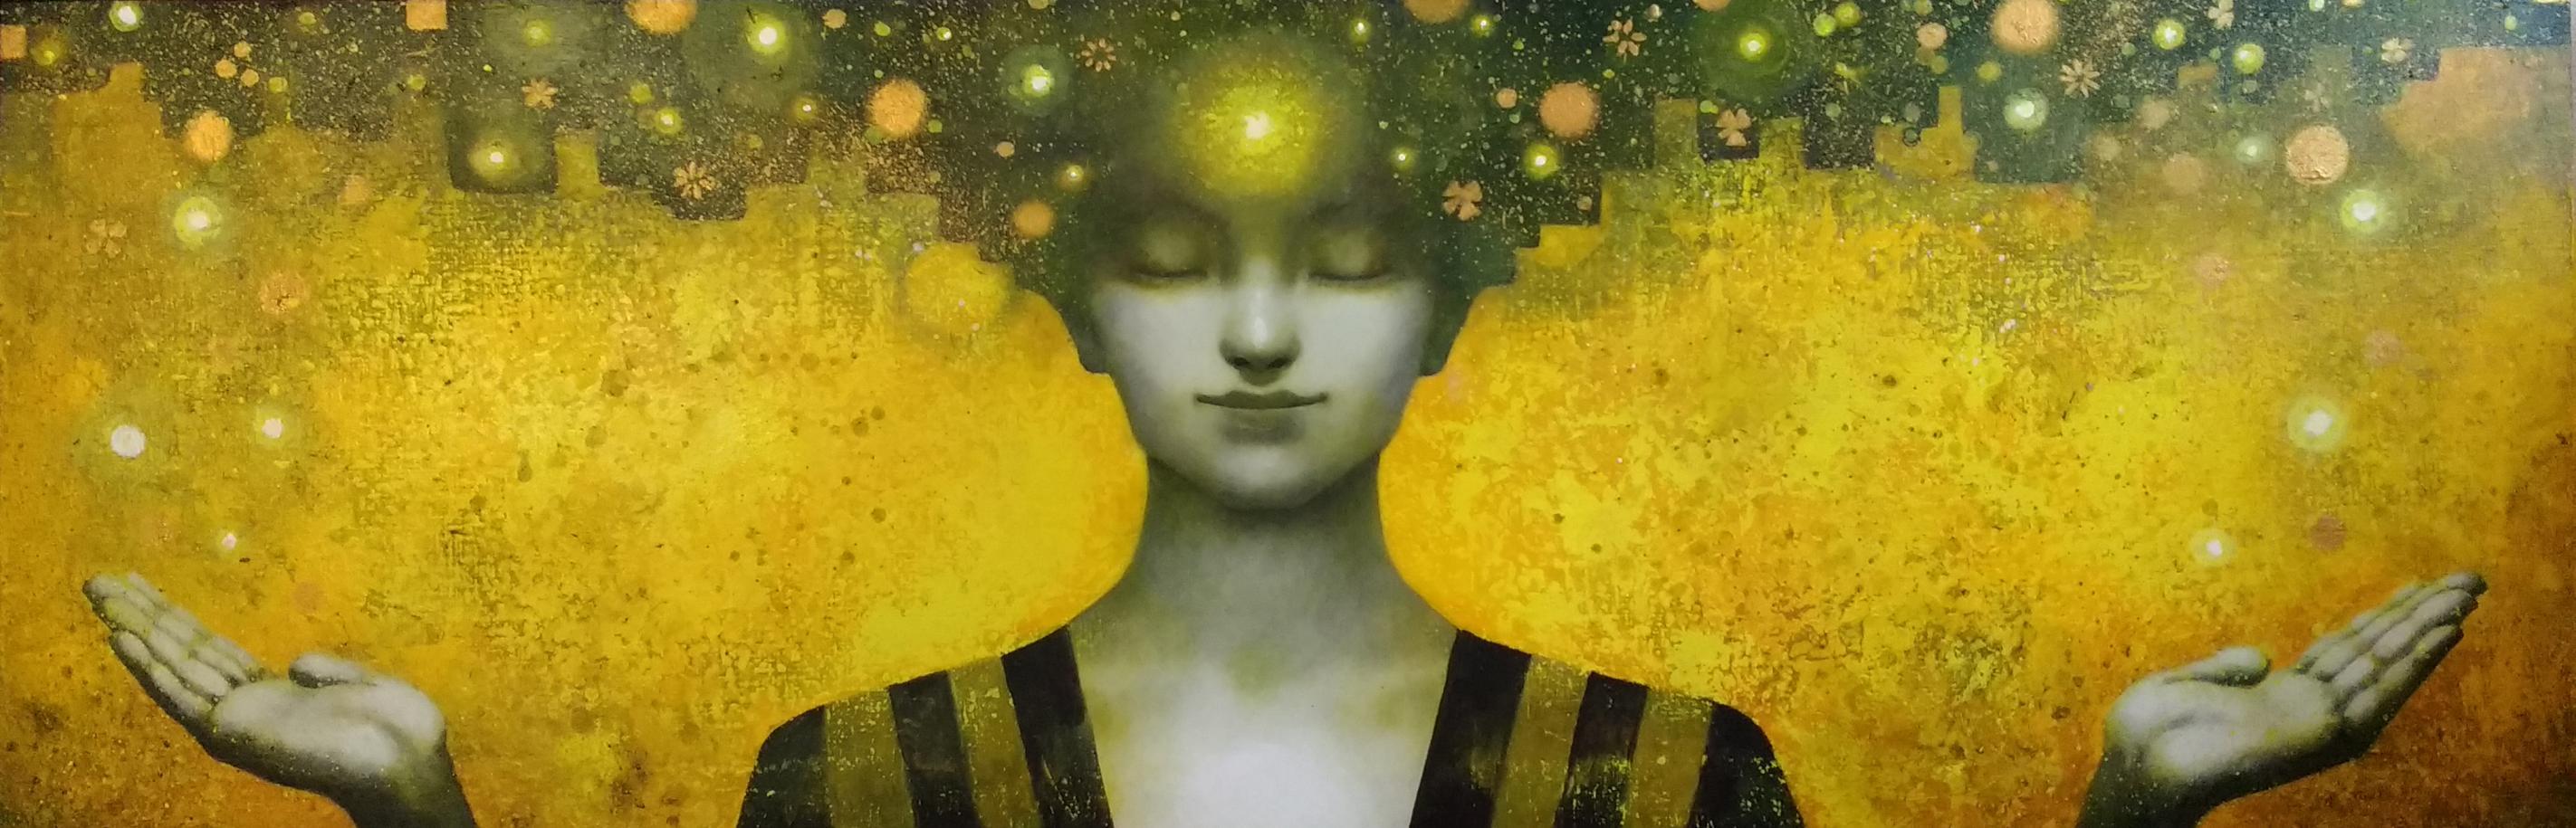 Abundancia   (VENDID0) (2017) - Nicoletta Tomas Caravia